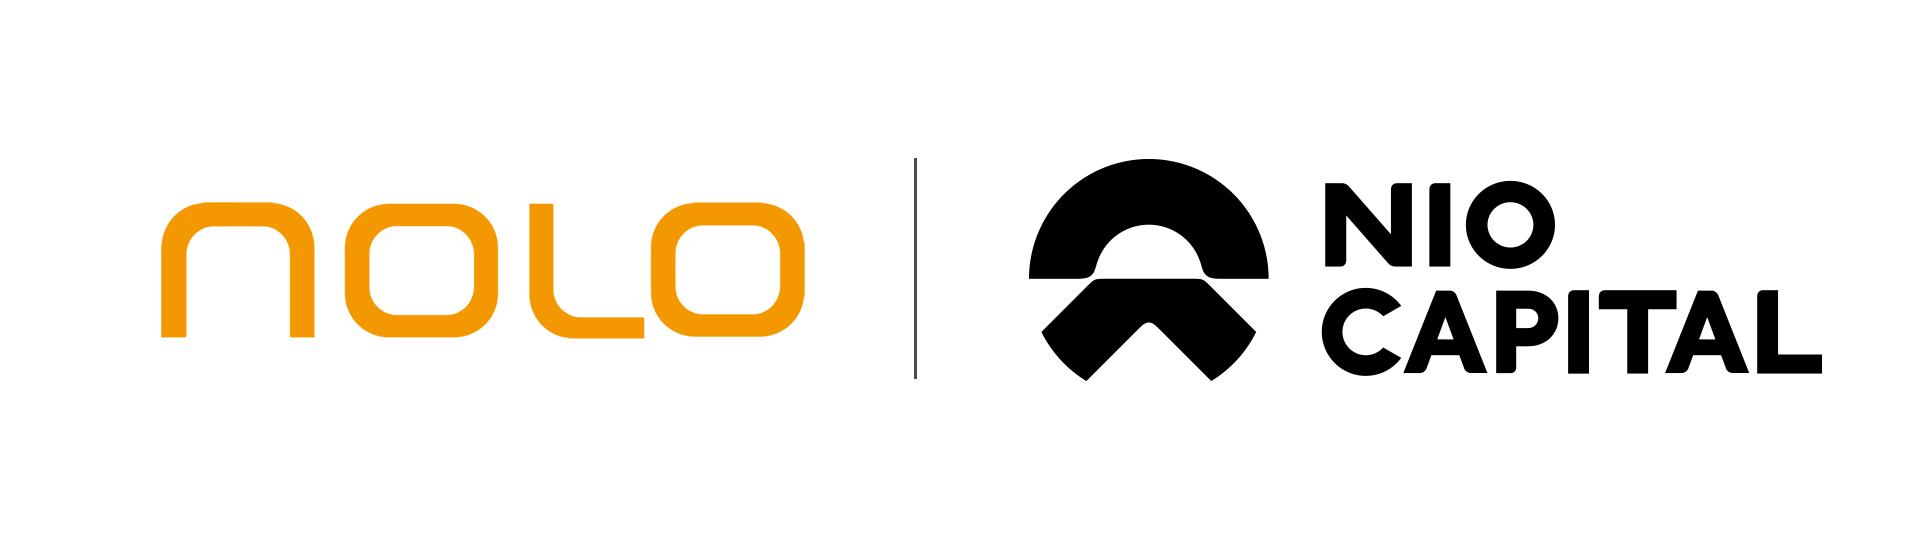 NOLO VR完成2000万美元B轮融资,2021年将发两款6DoF新品